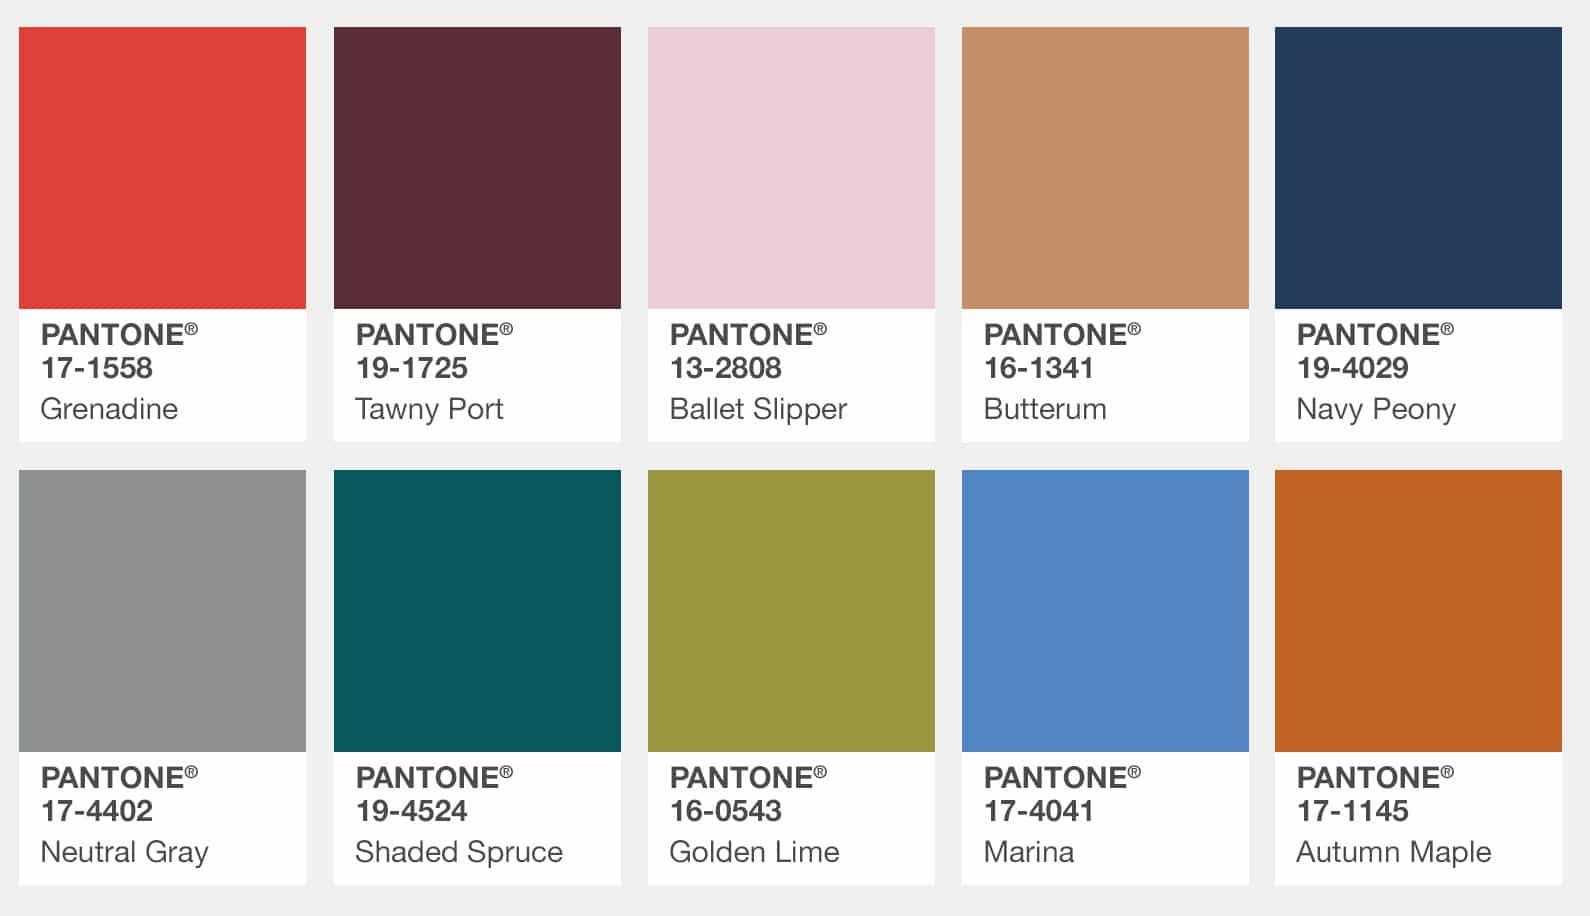 pantone-color-swatches-palette-fashion-color-report-fall-2017-new-york Женская мода осень зима 2017-2018: основные тенденции, фото